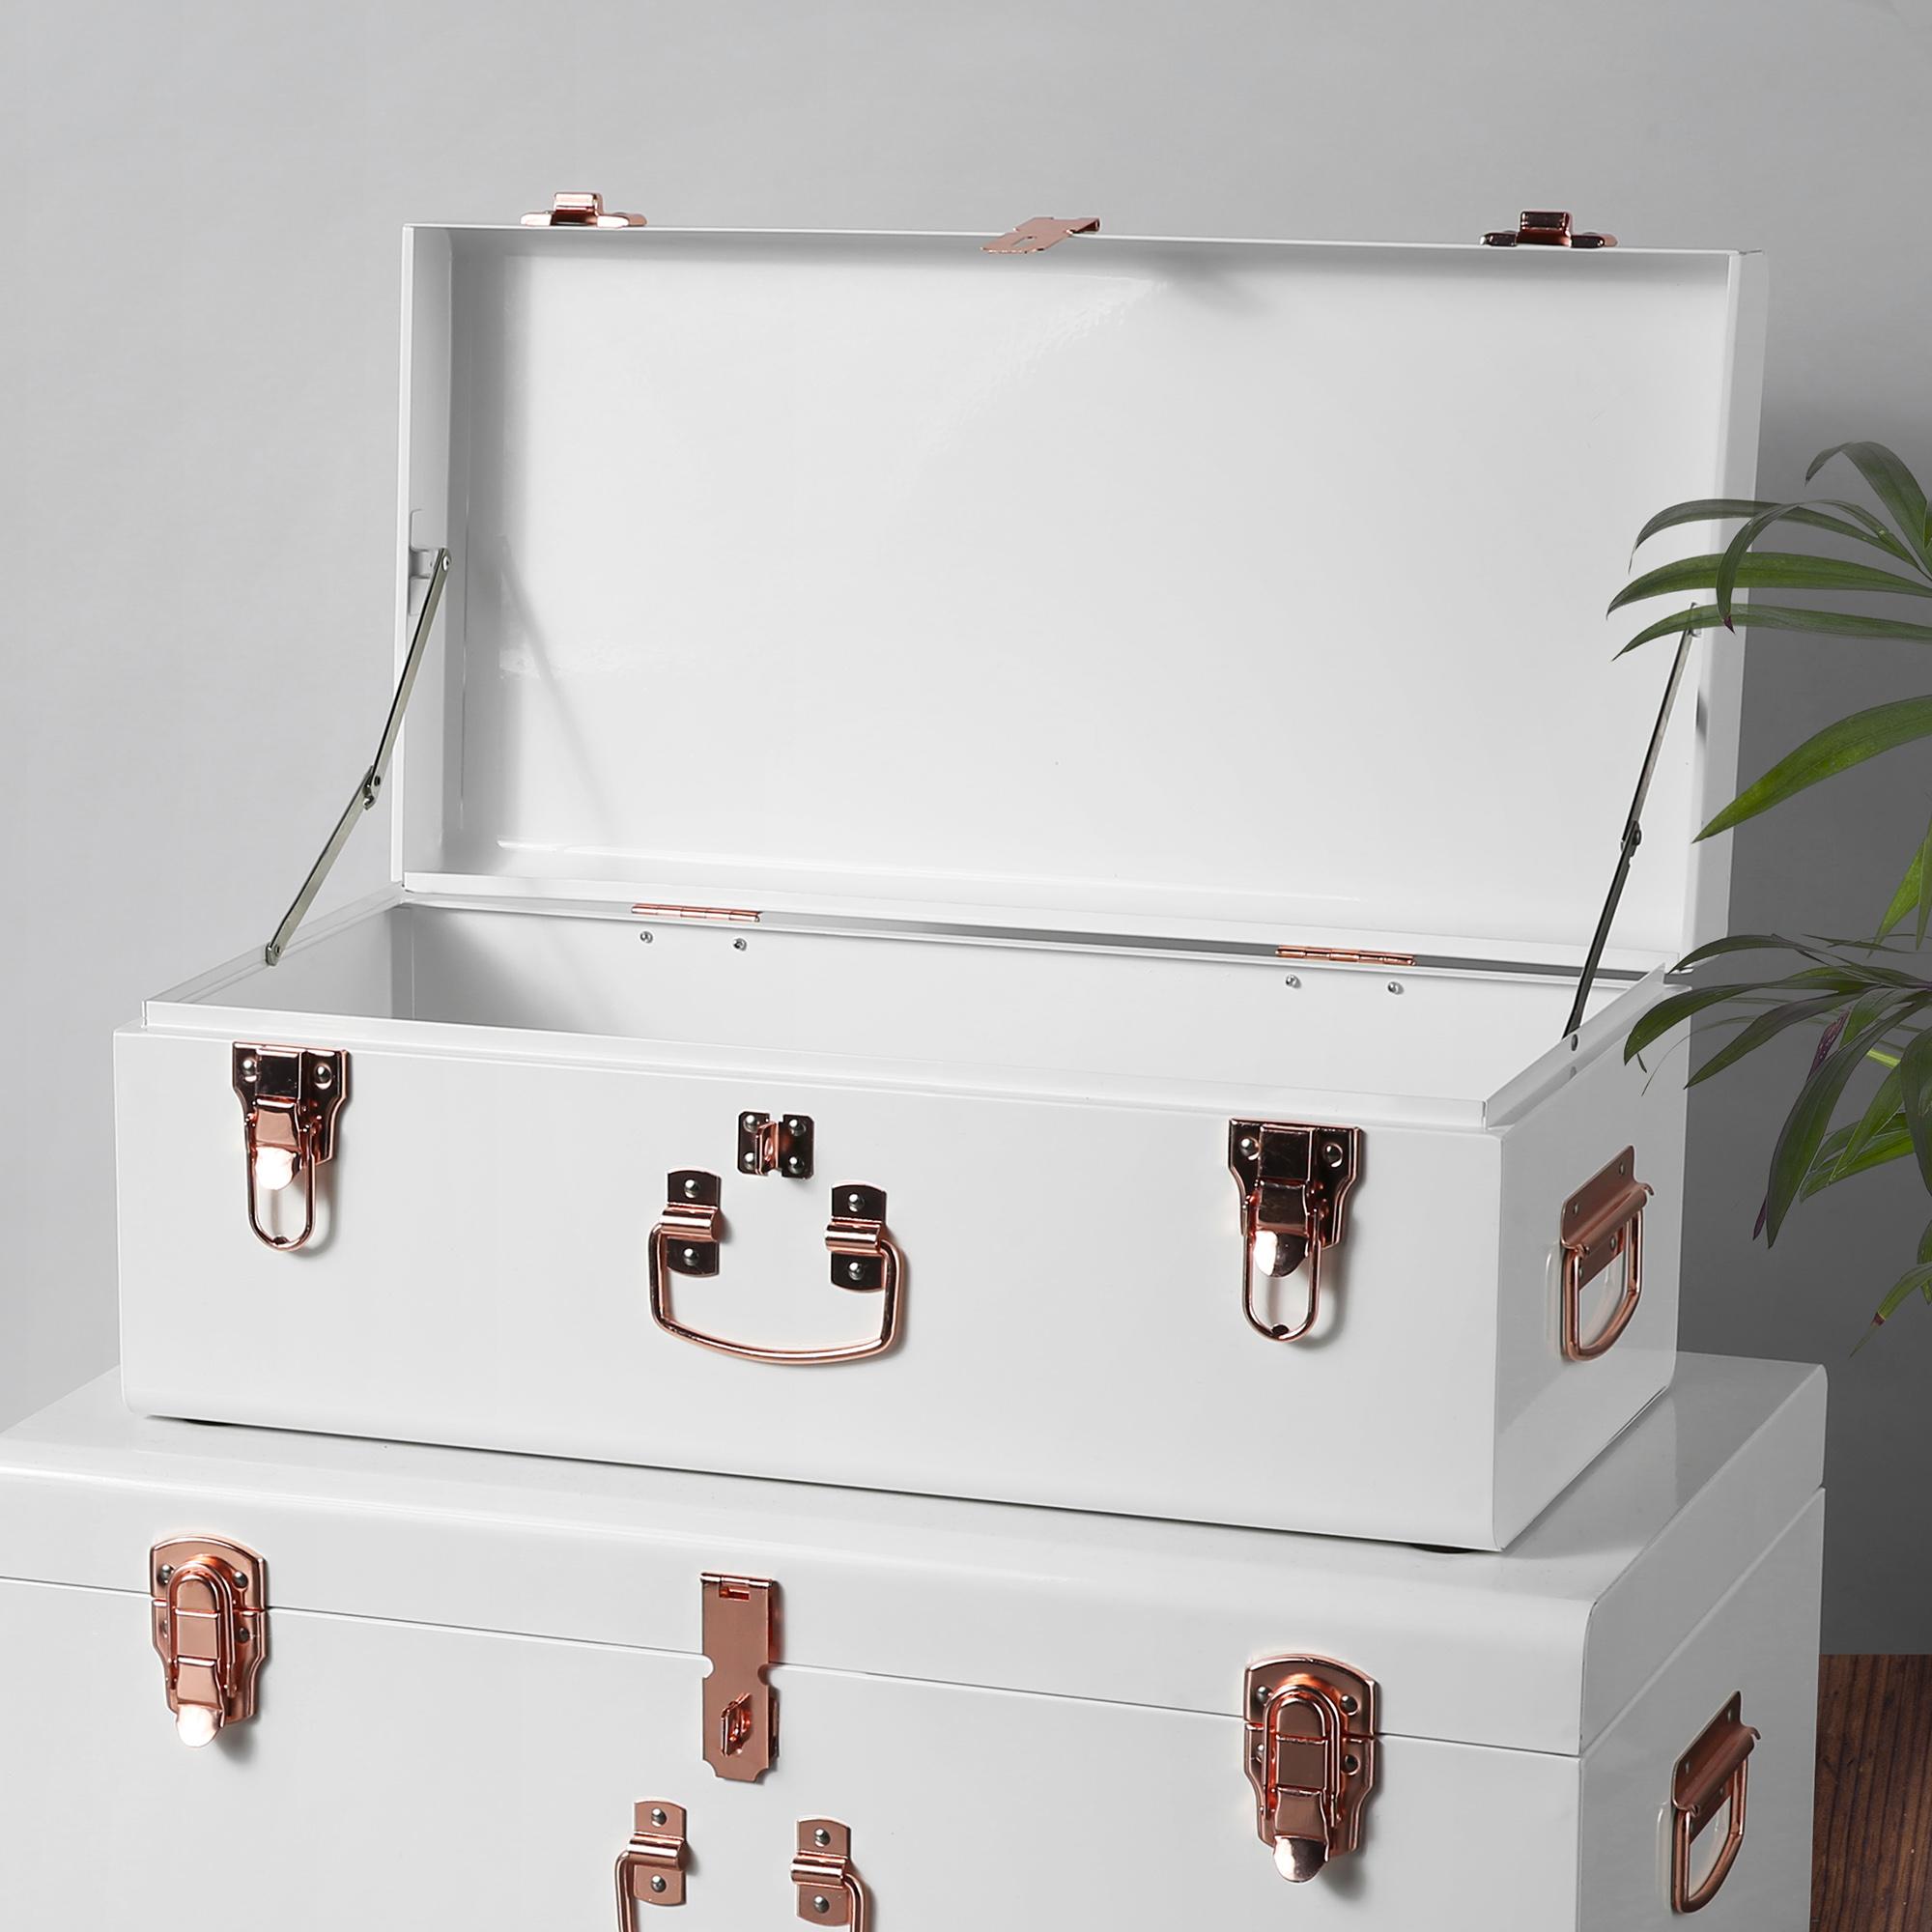 Genial Sentinel Beautify Cream Vintage Style Steel Storage Trunk Set With Rose  Gold Handles   College Dorm